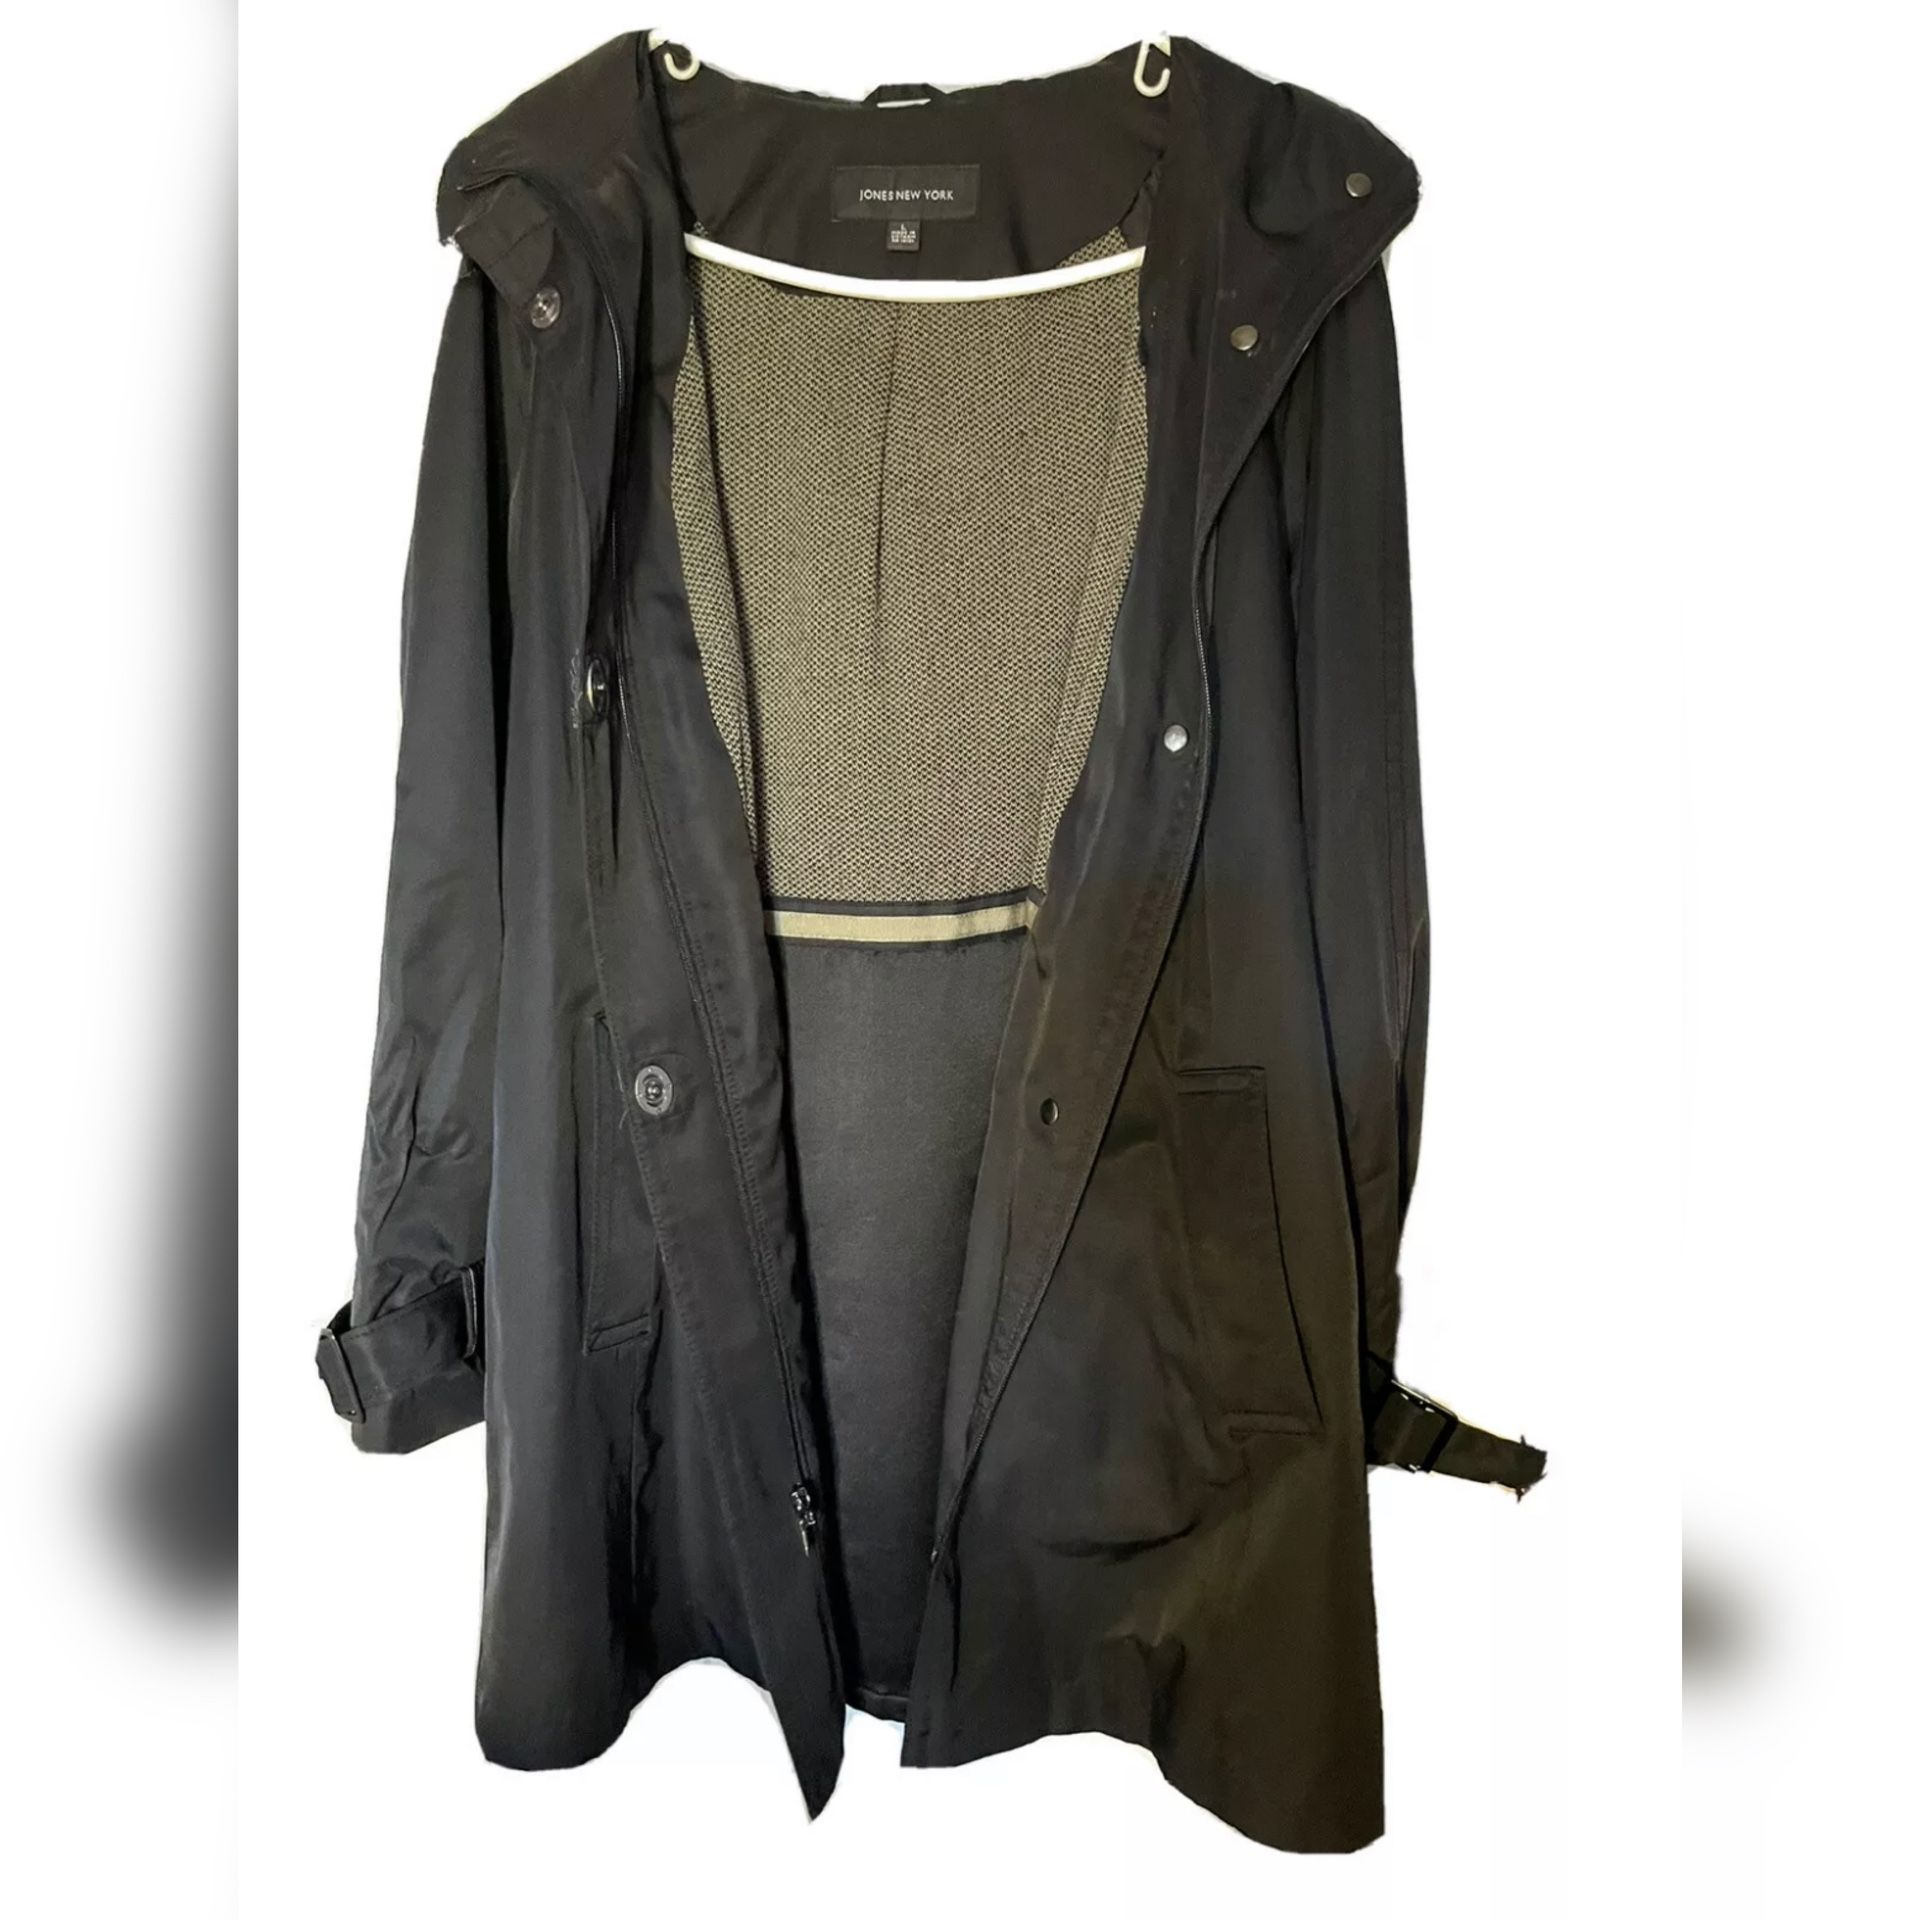 Jones New York Womens Rain Jacket Black Windbreaker Waterproof.